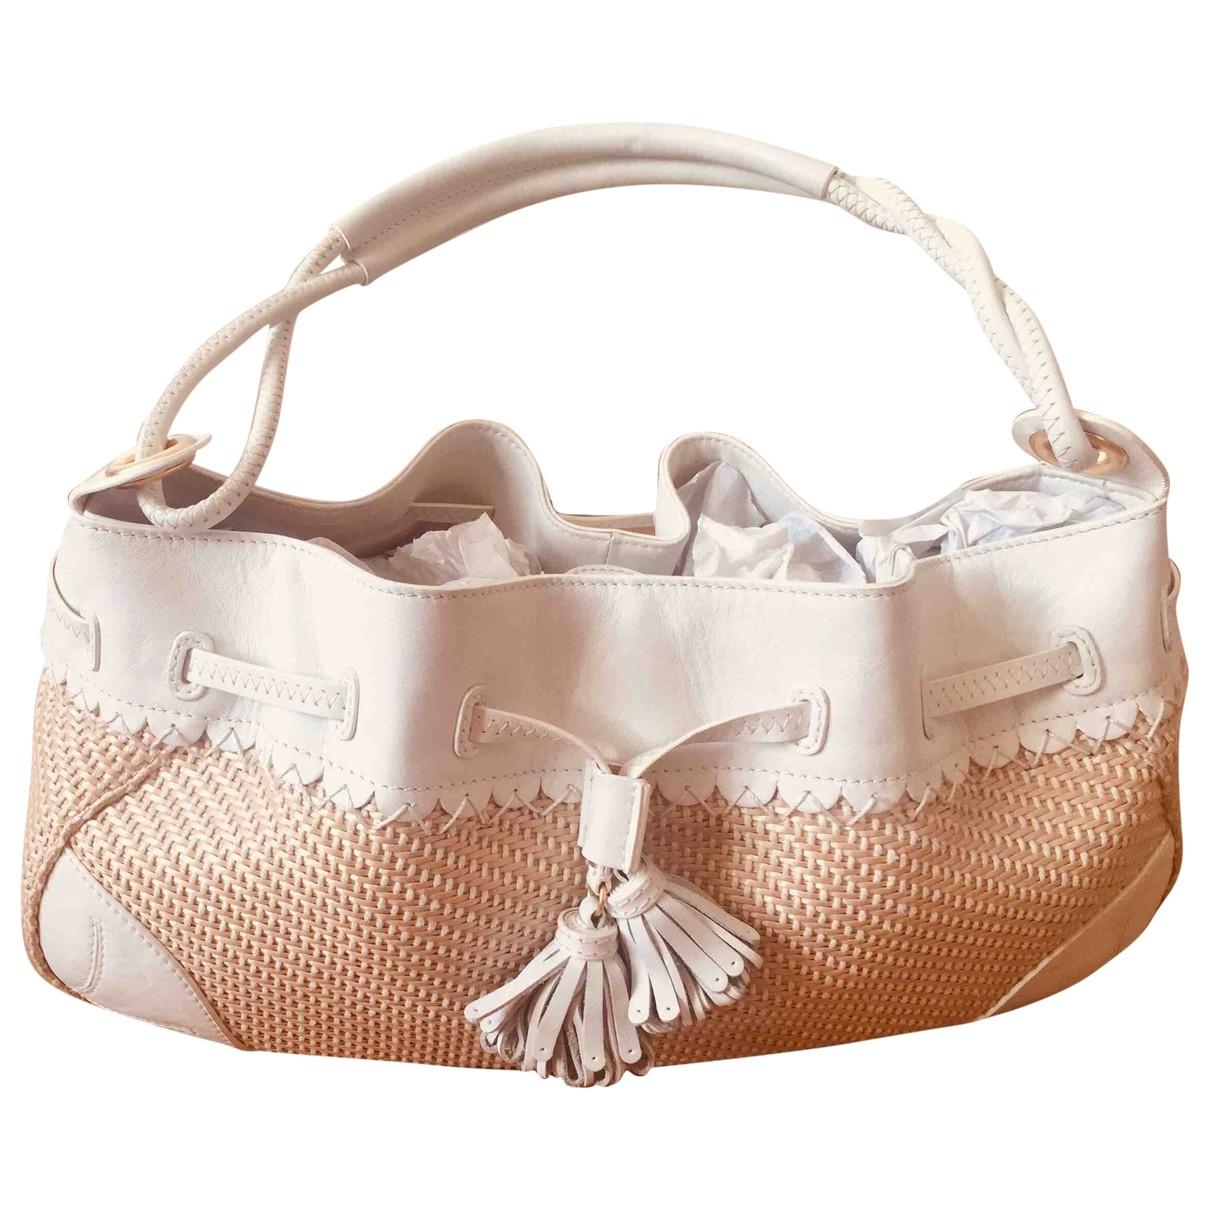 Cole Haan \N White Leather handbag for Women \N